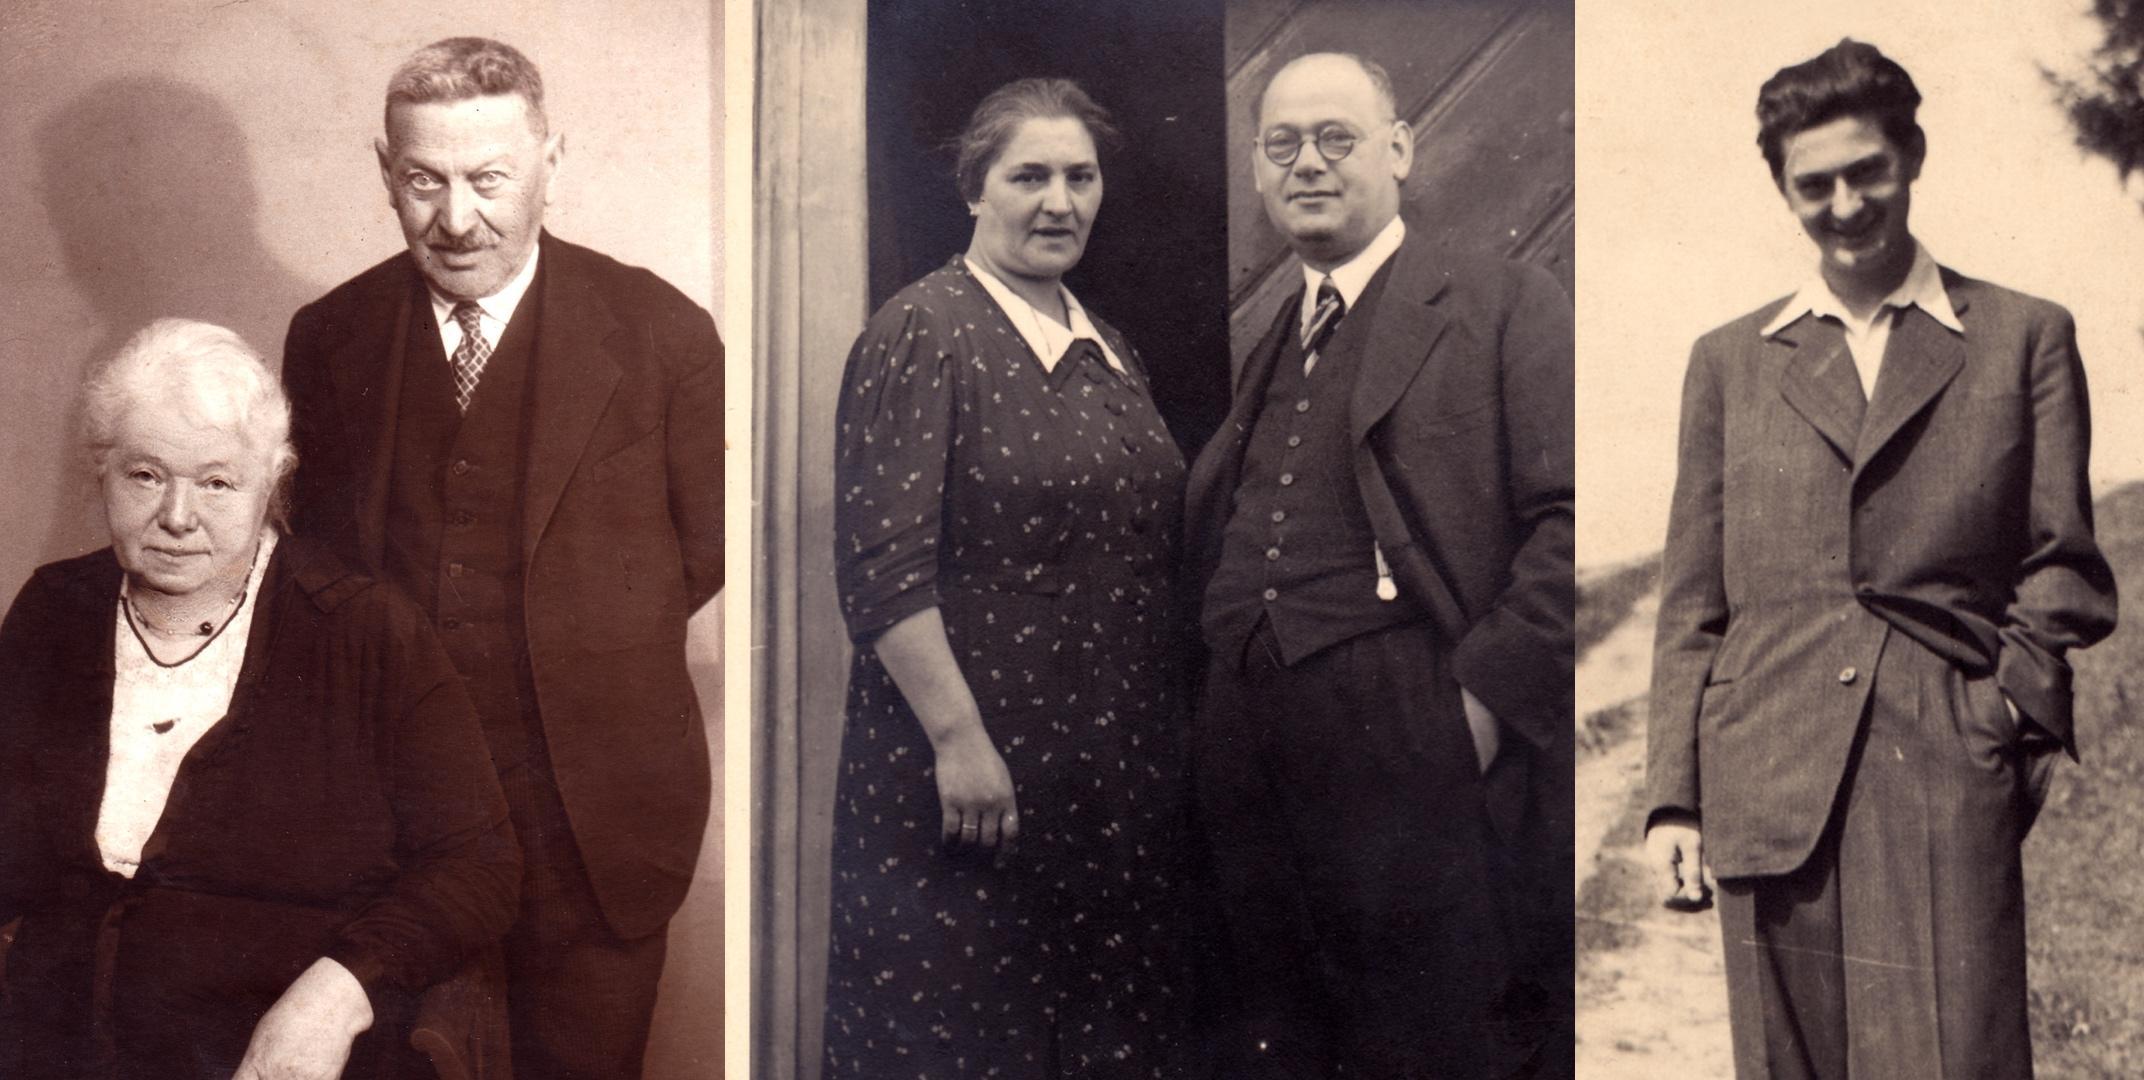 Zleva Terezie, Leopold, Sofie, Moris a Hanuš Grünwaldovi